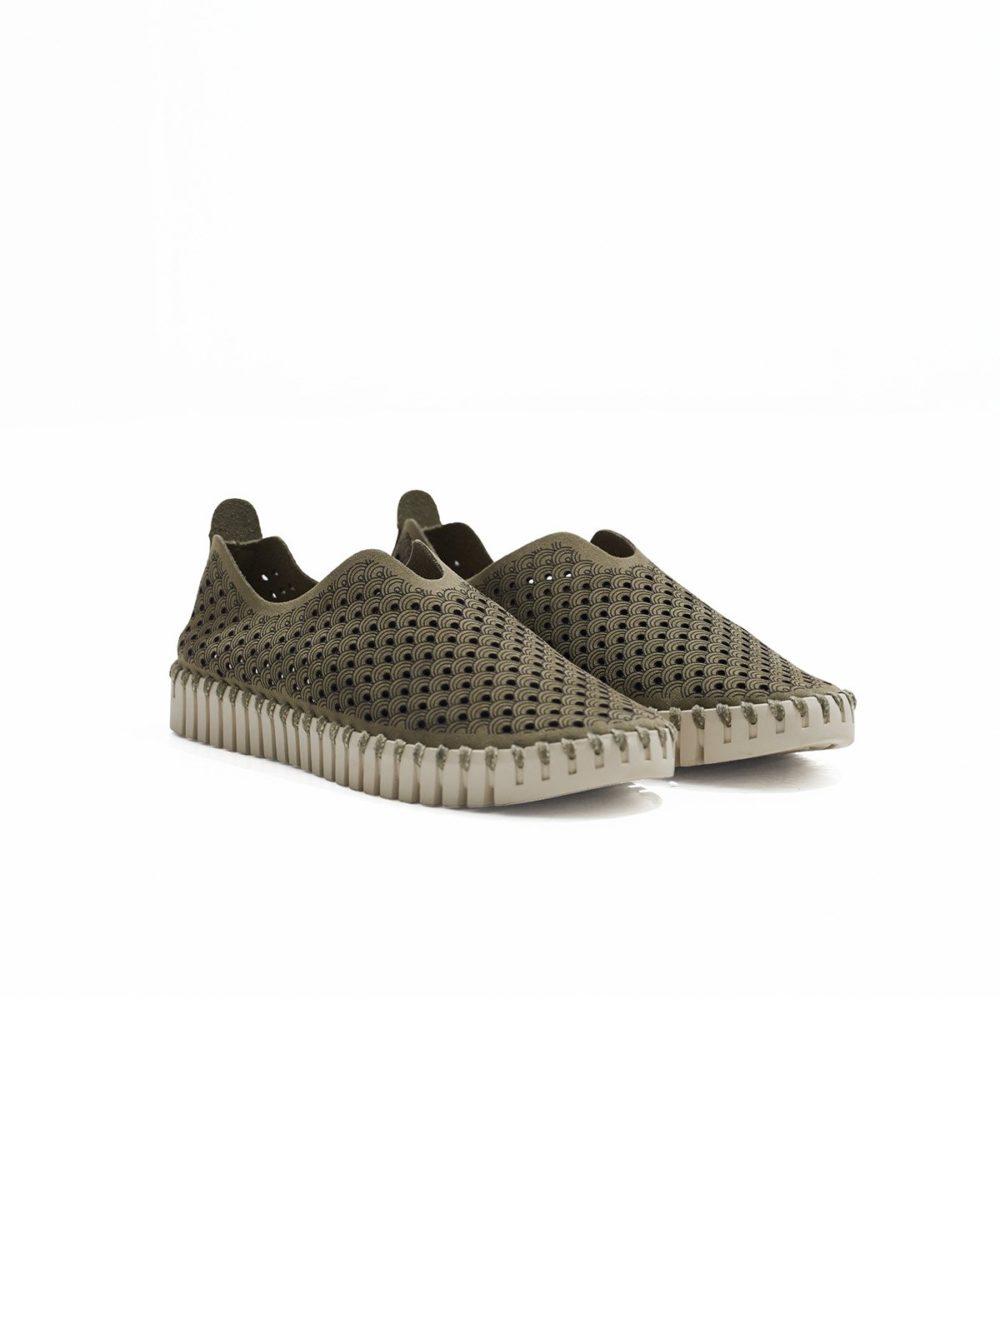 Tulip Flats Ilse Jacobsen Katie Kerr Women's Shoes